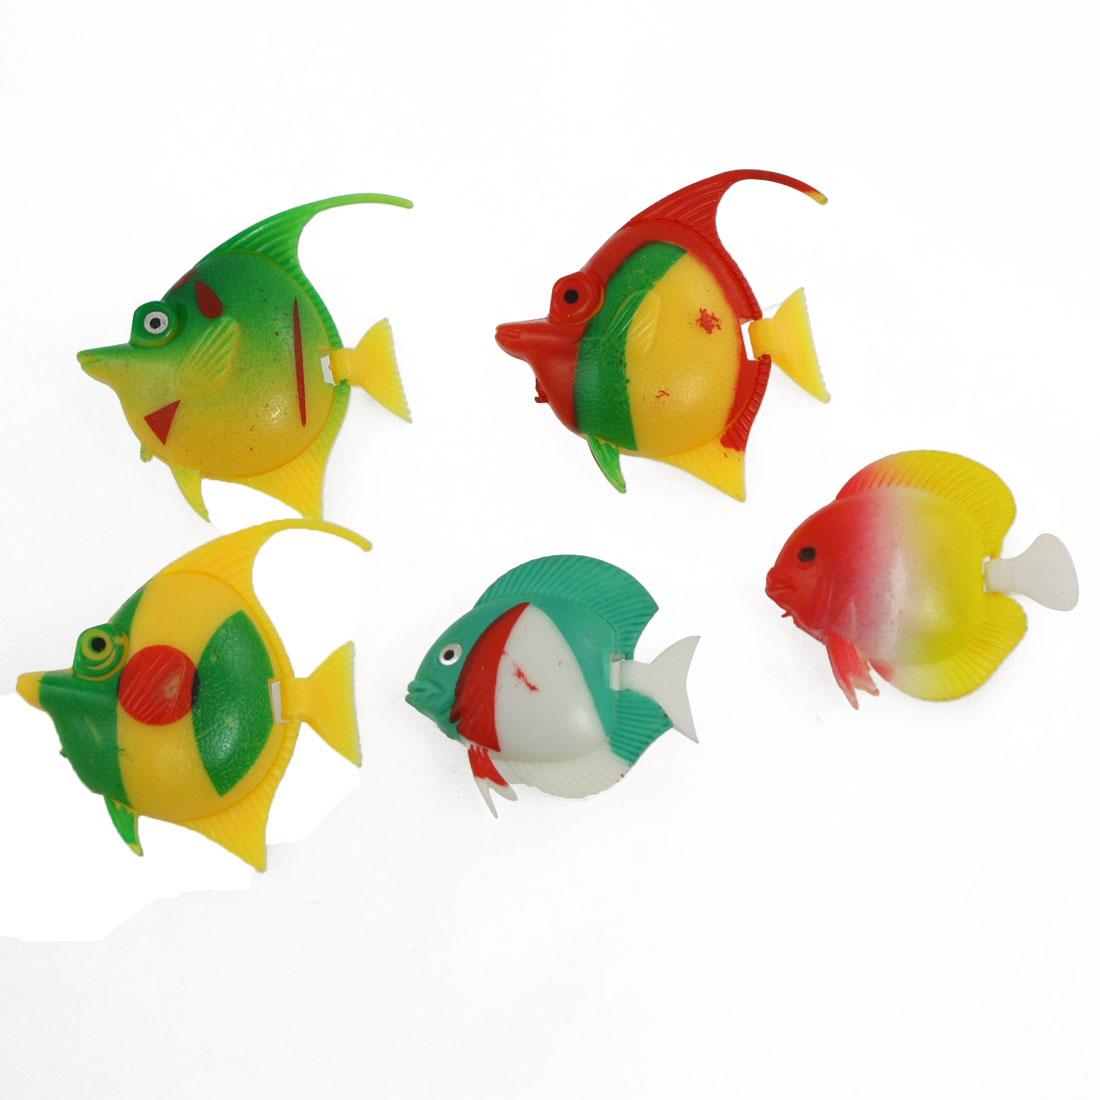 5 Pcs Tank Aquarium Colorful Plastic Tropical Fish Decoration